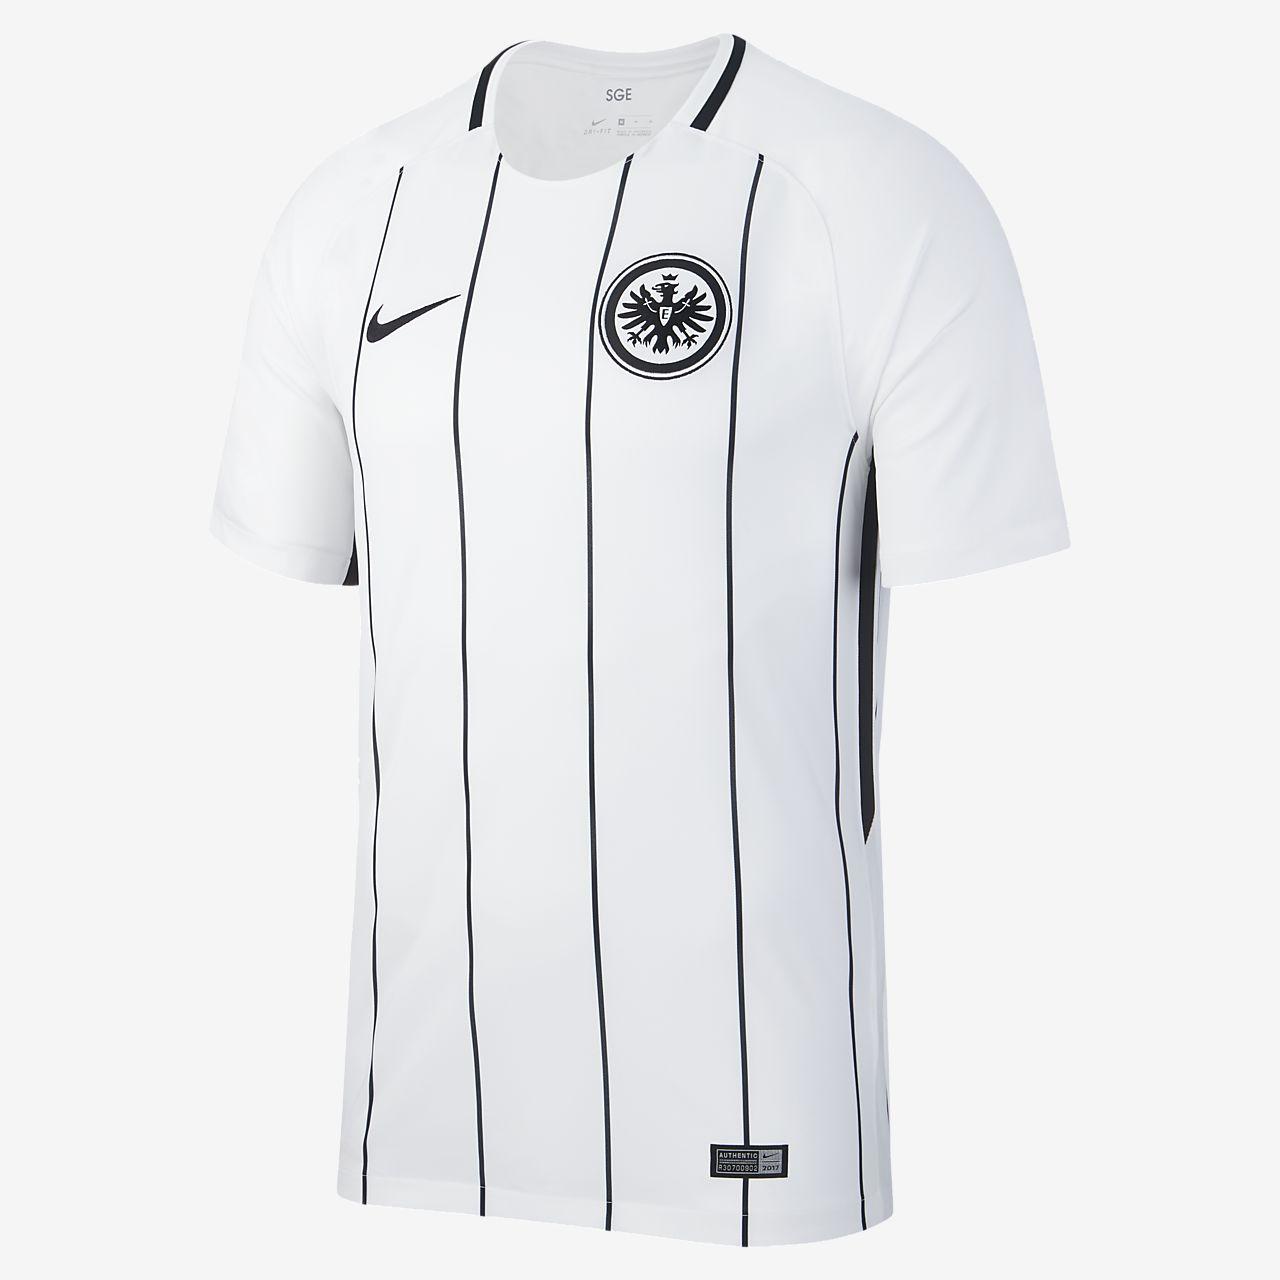 2017/18 Eintracht Frankfurt Stadium Home Men's Football Shirt